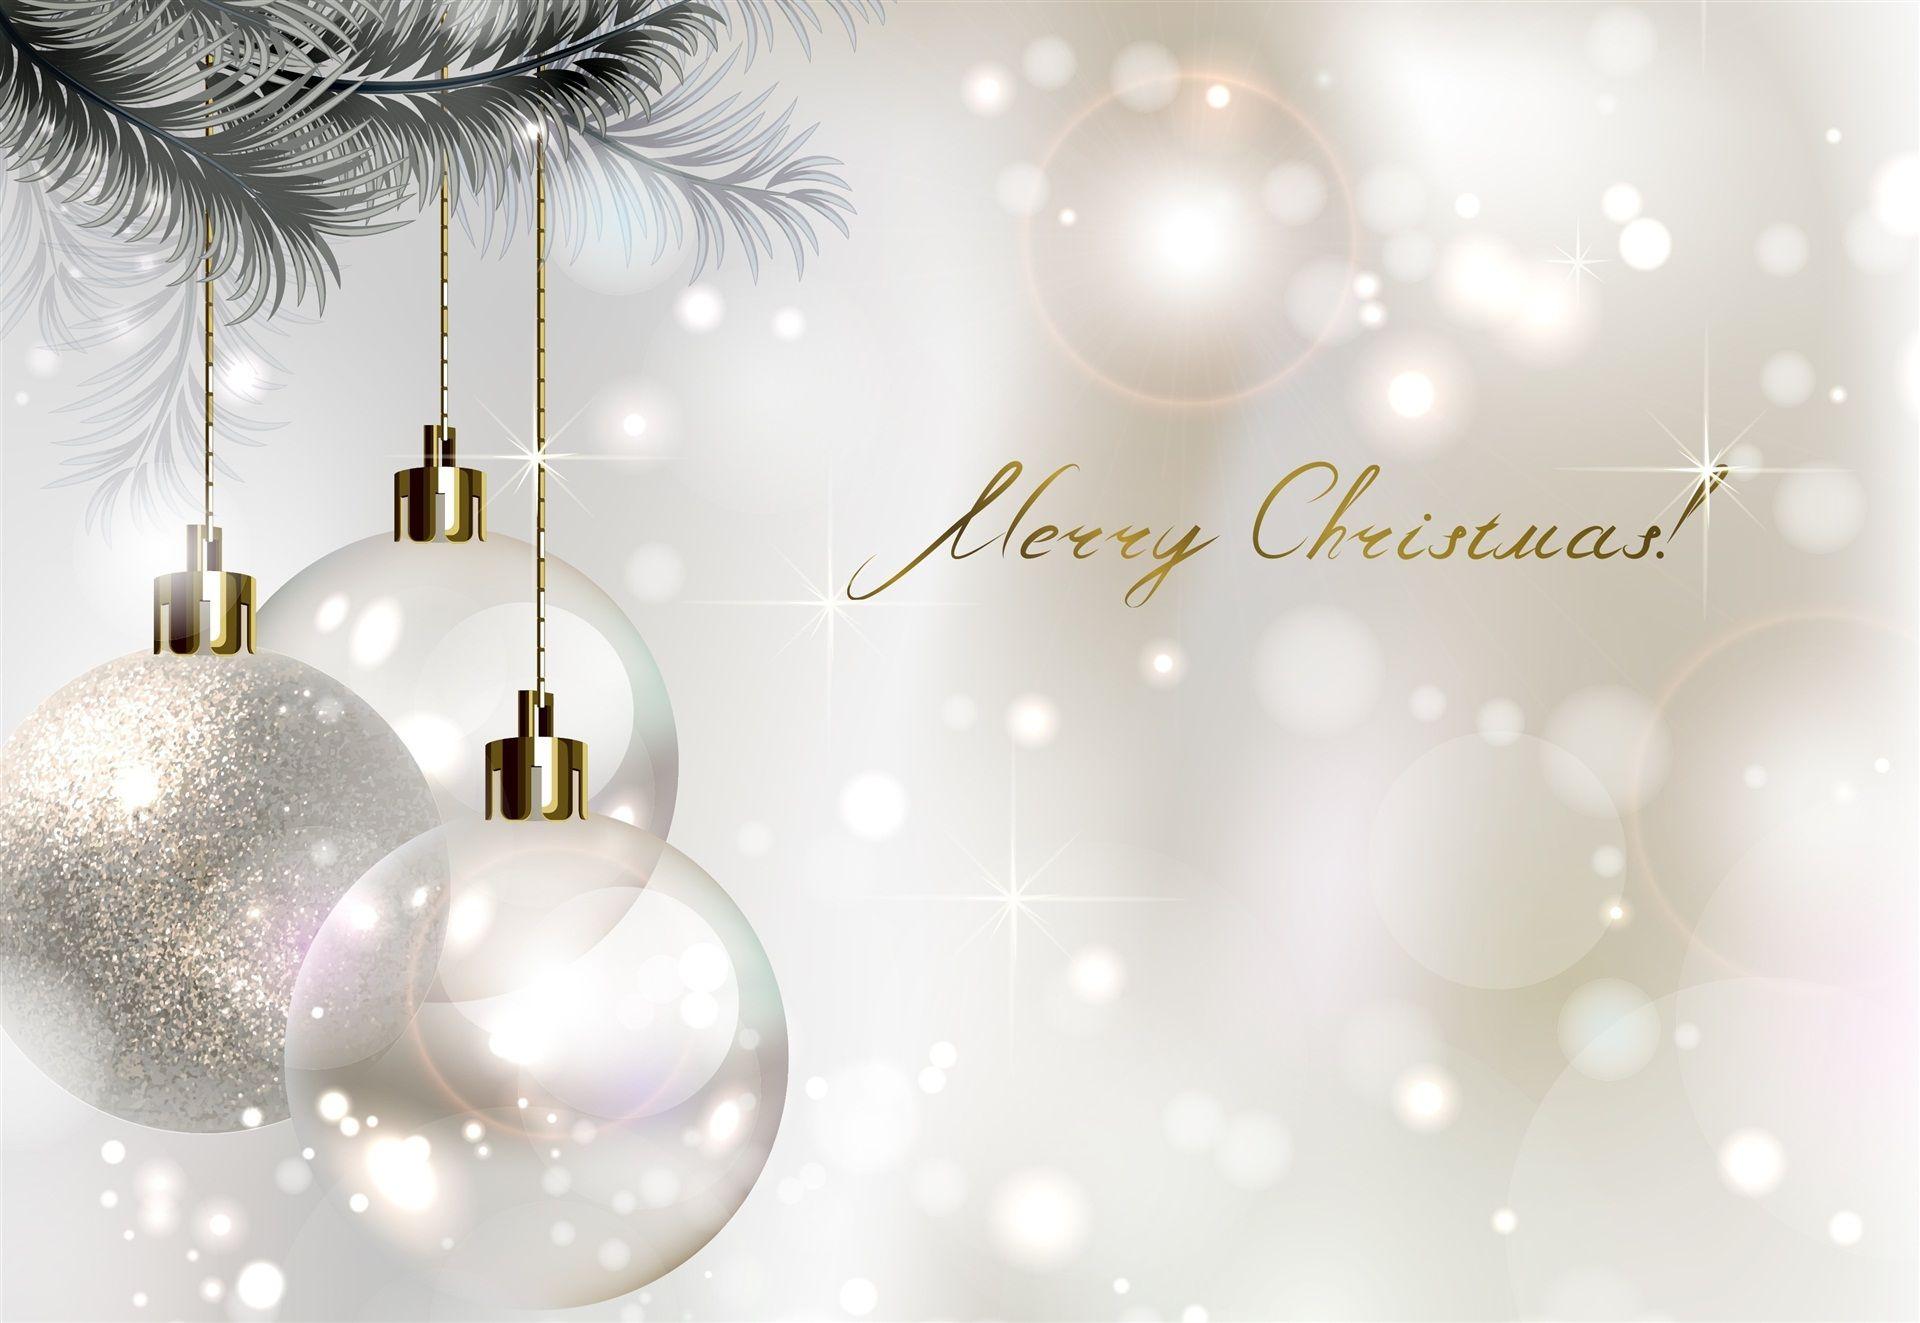 wallpaper Christmas tree, Christmas decorations, balloons